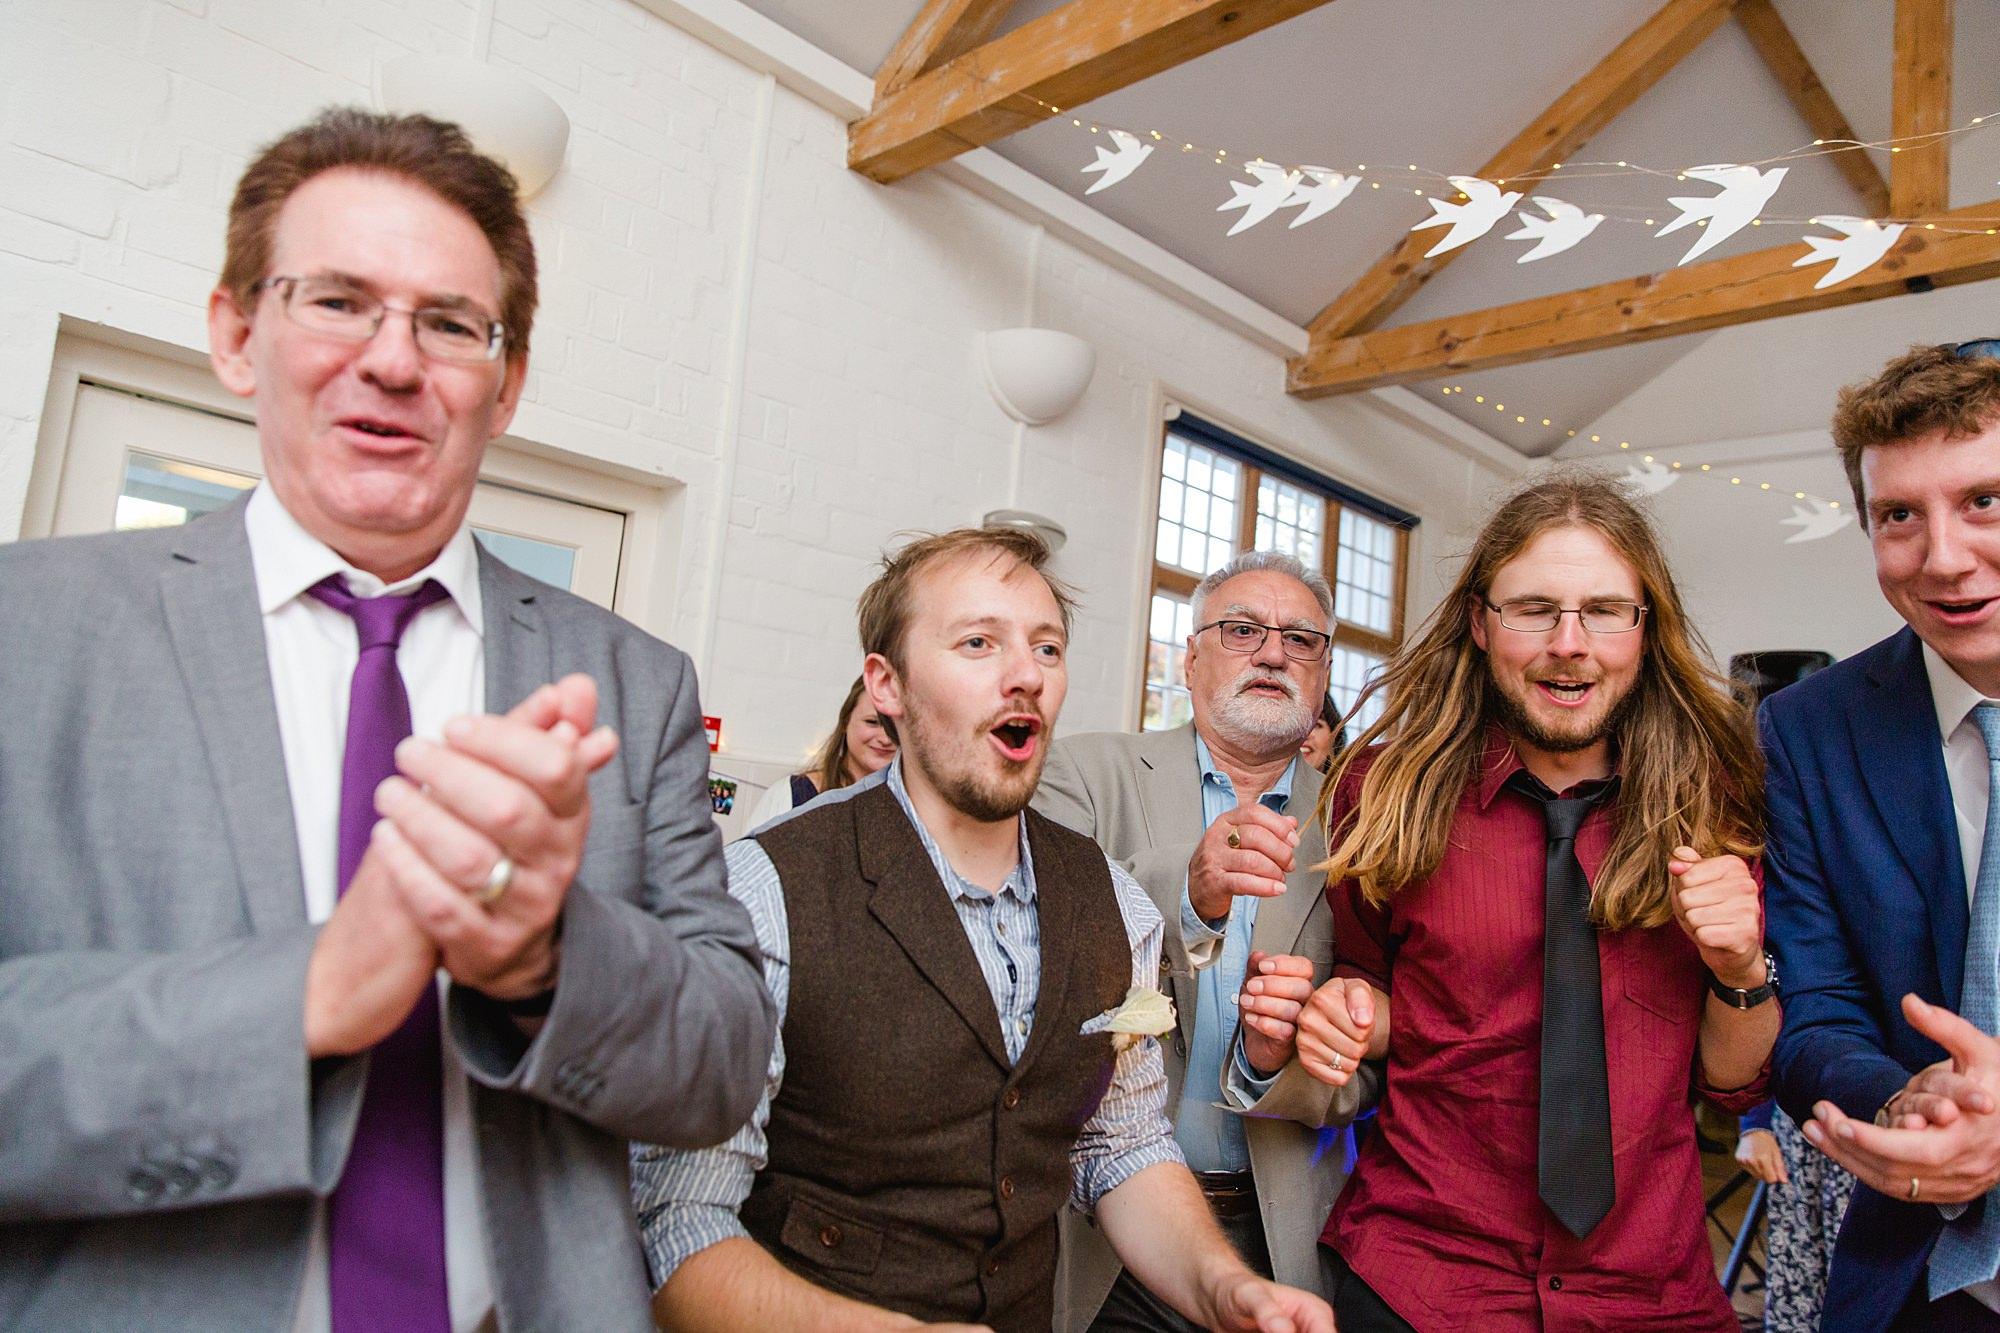 Fun village hall wedding groom and friends dancing in ceilidh